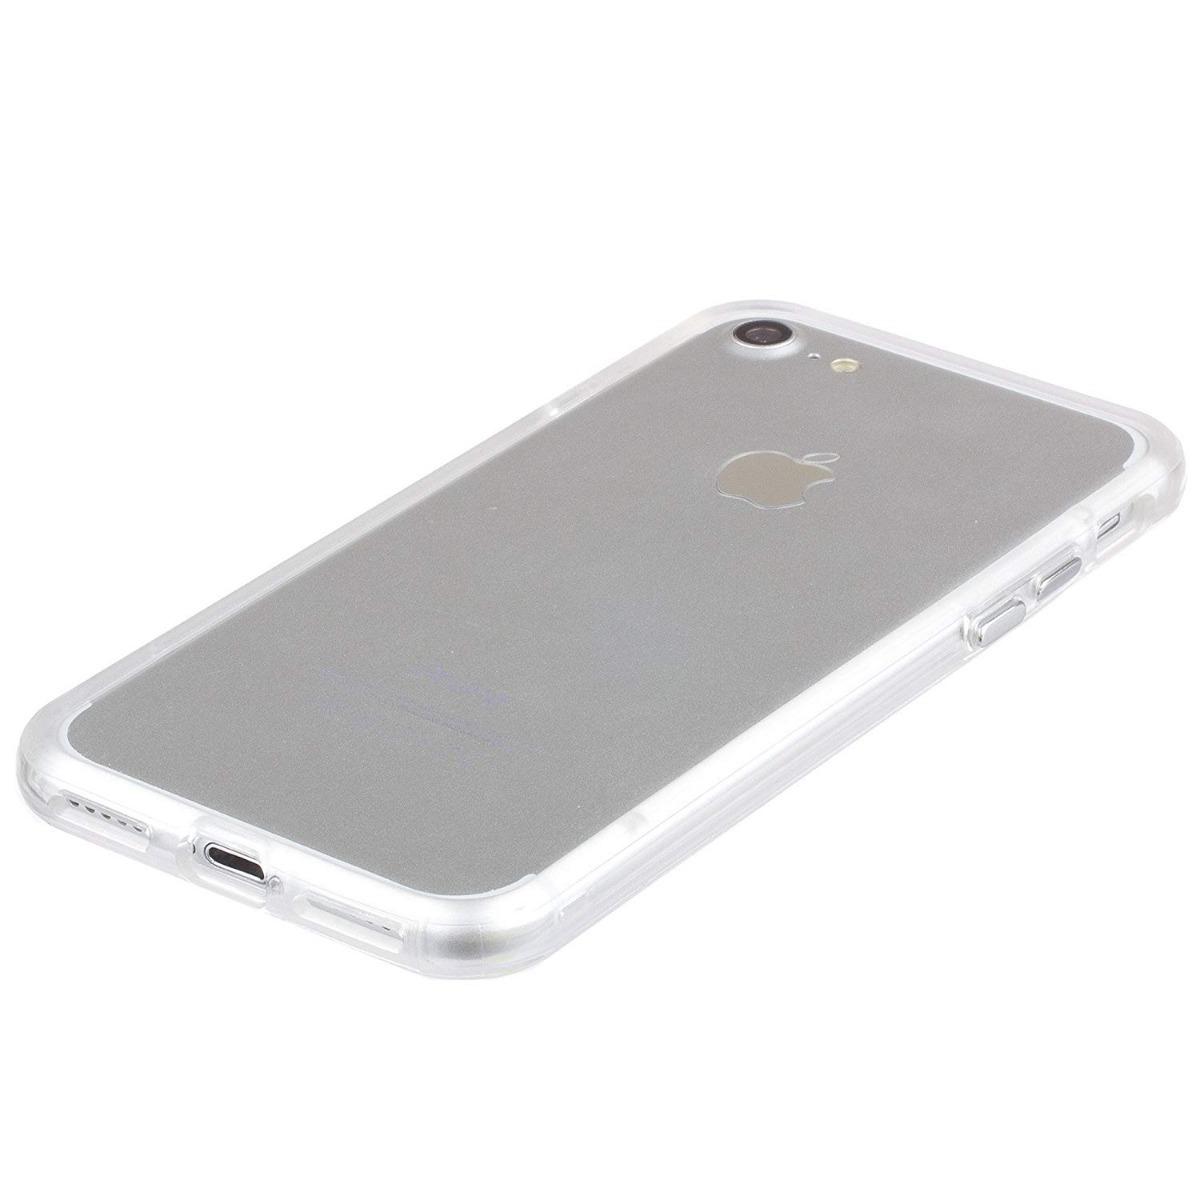 5fb71a61c63 Funda Carcasa Transparente iPhone 7 iPhone 8 - $ 499.00 en Mercado Libre